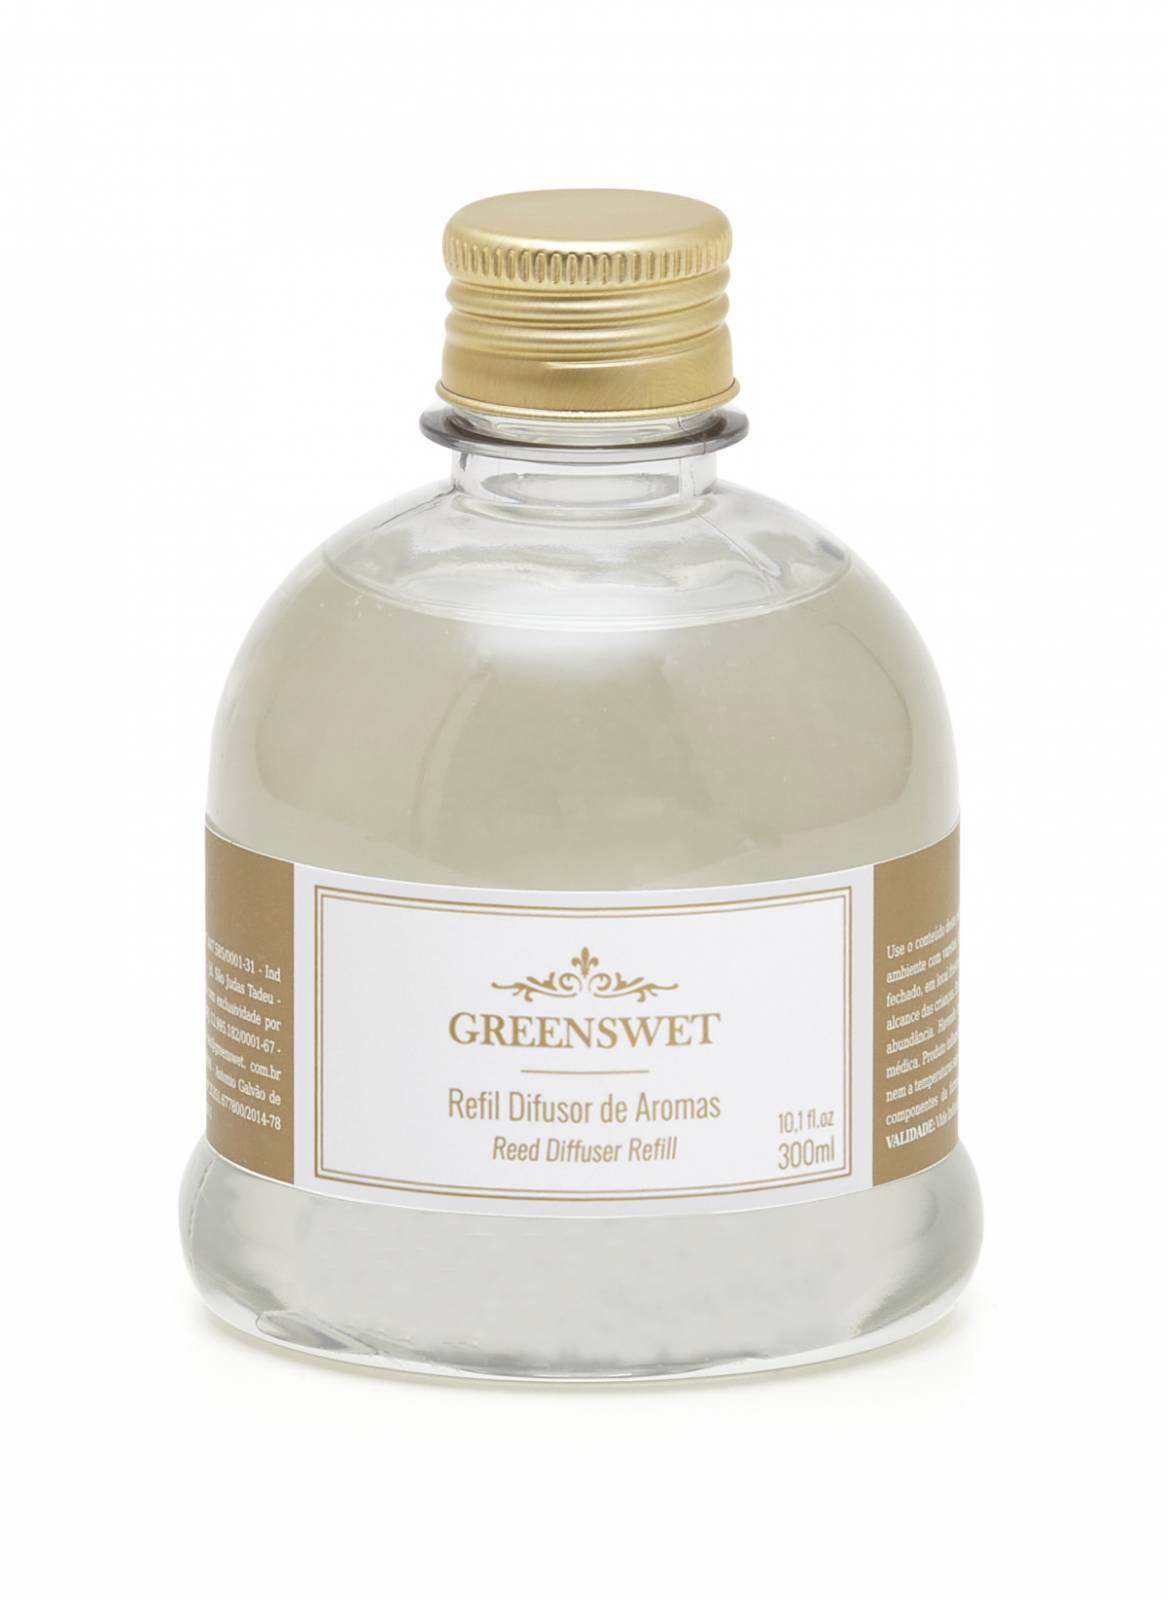 Refil Difusor de Aromas 300ml Essência Chá Branco - Greenswet Aromatizantes